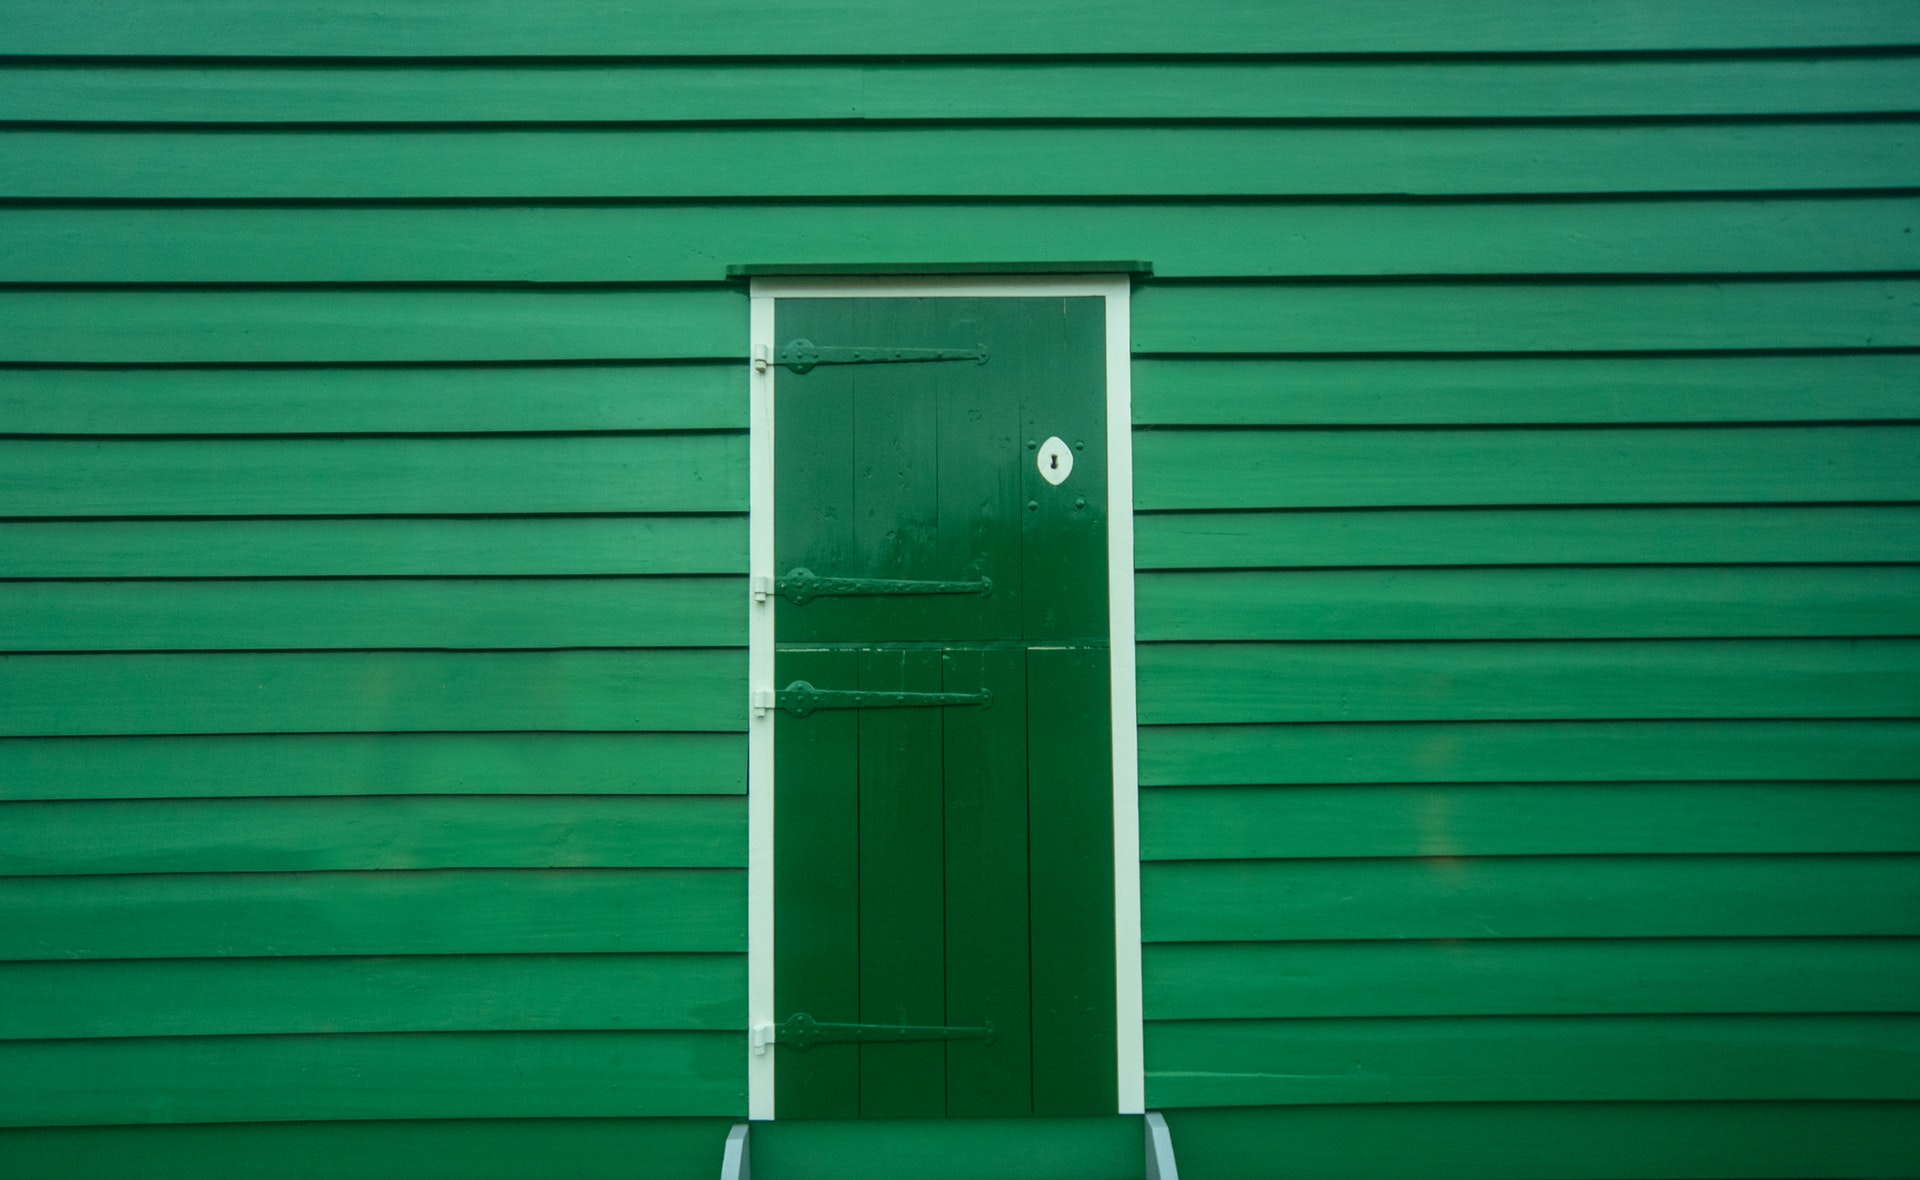 Green building certification programs||ENERGY STAR|